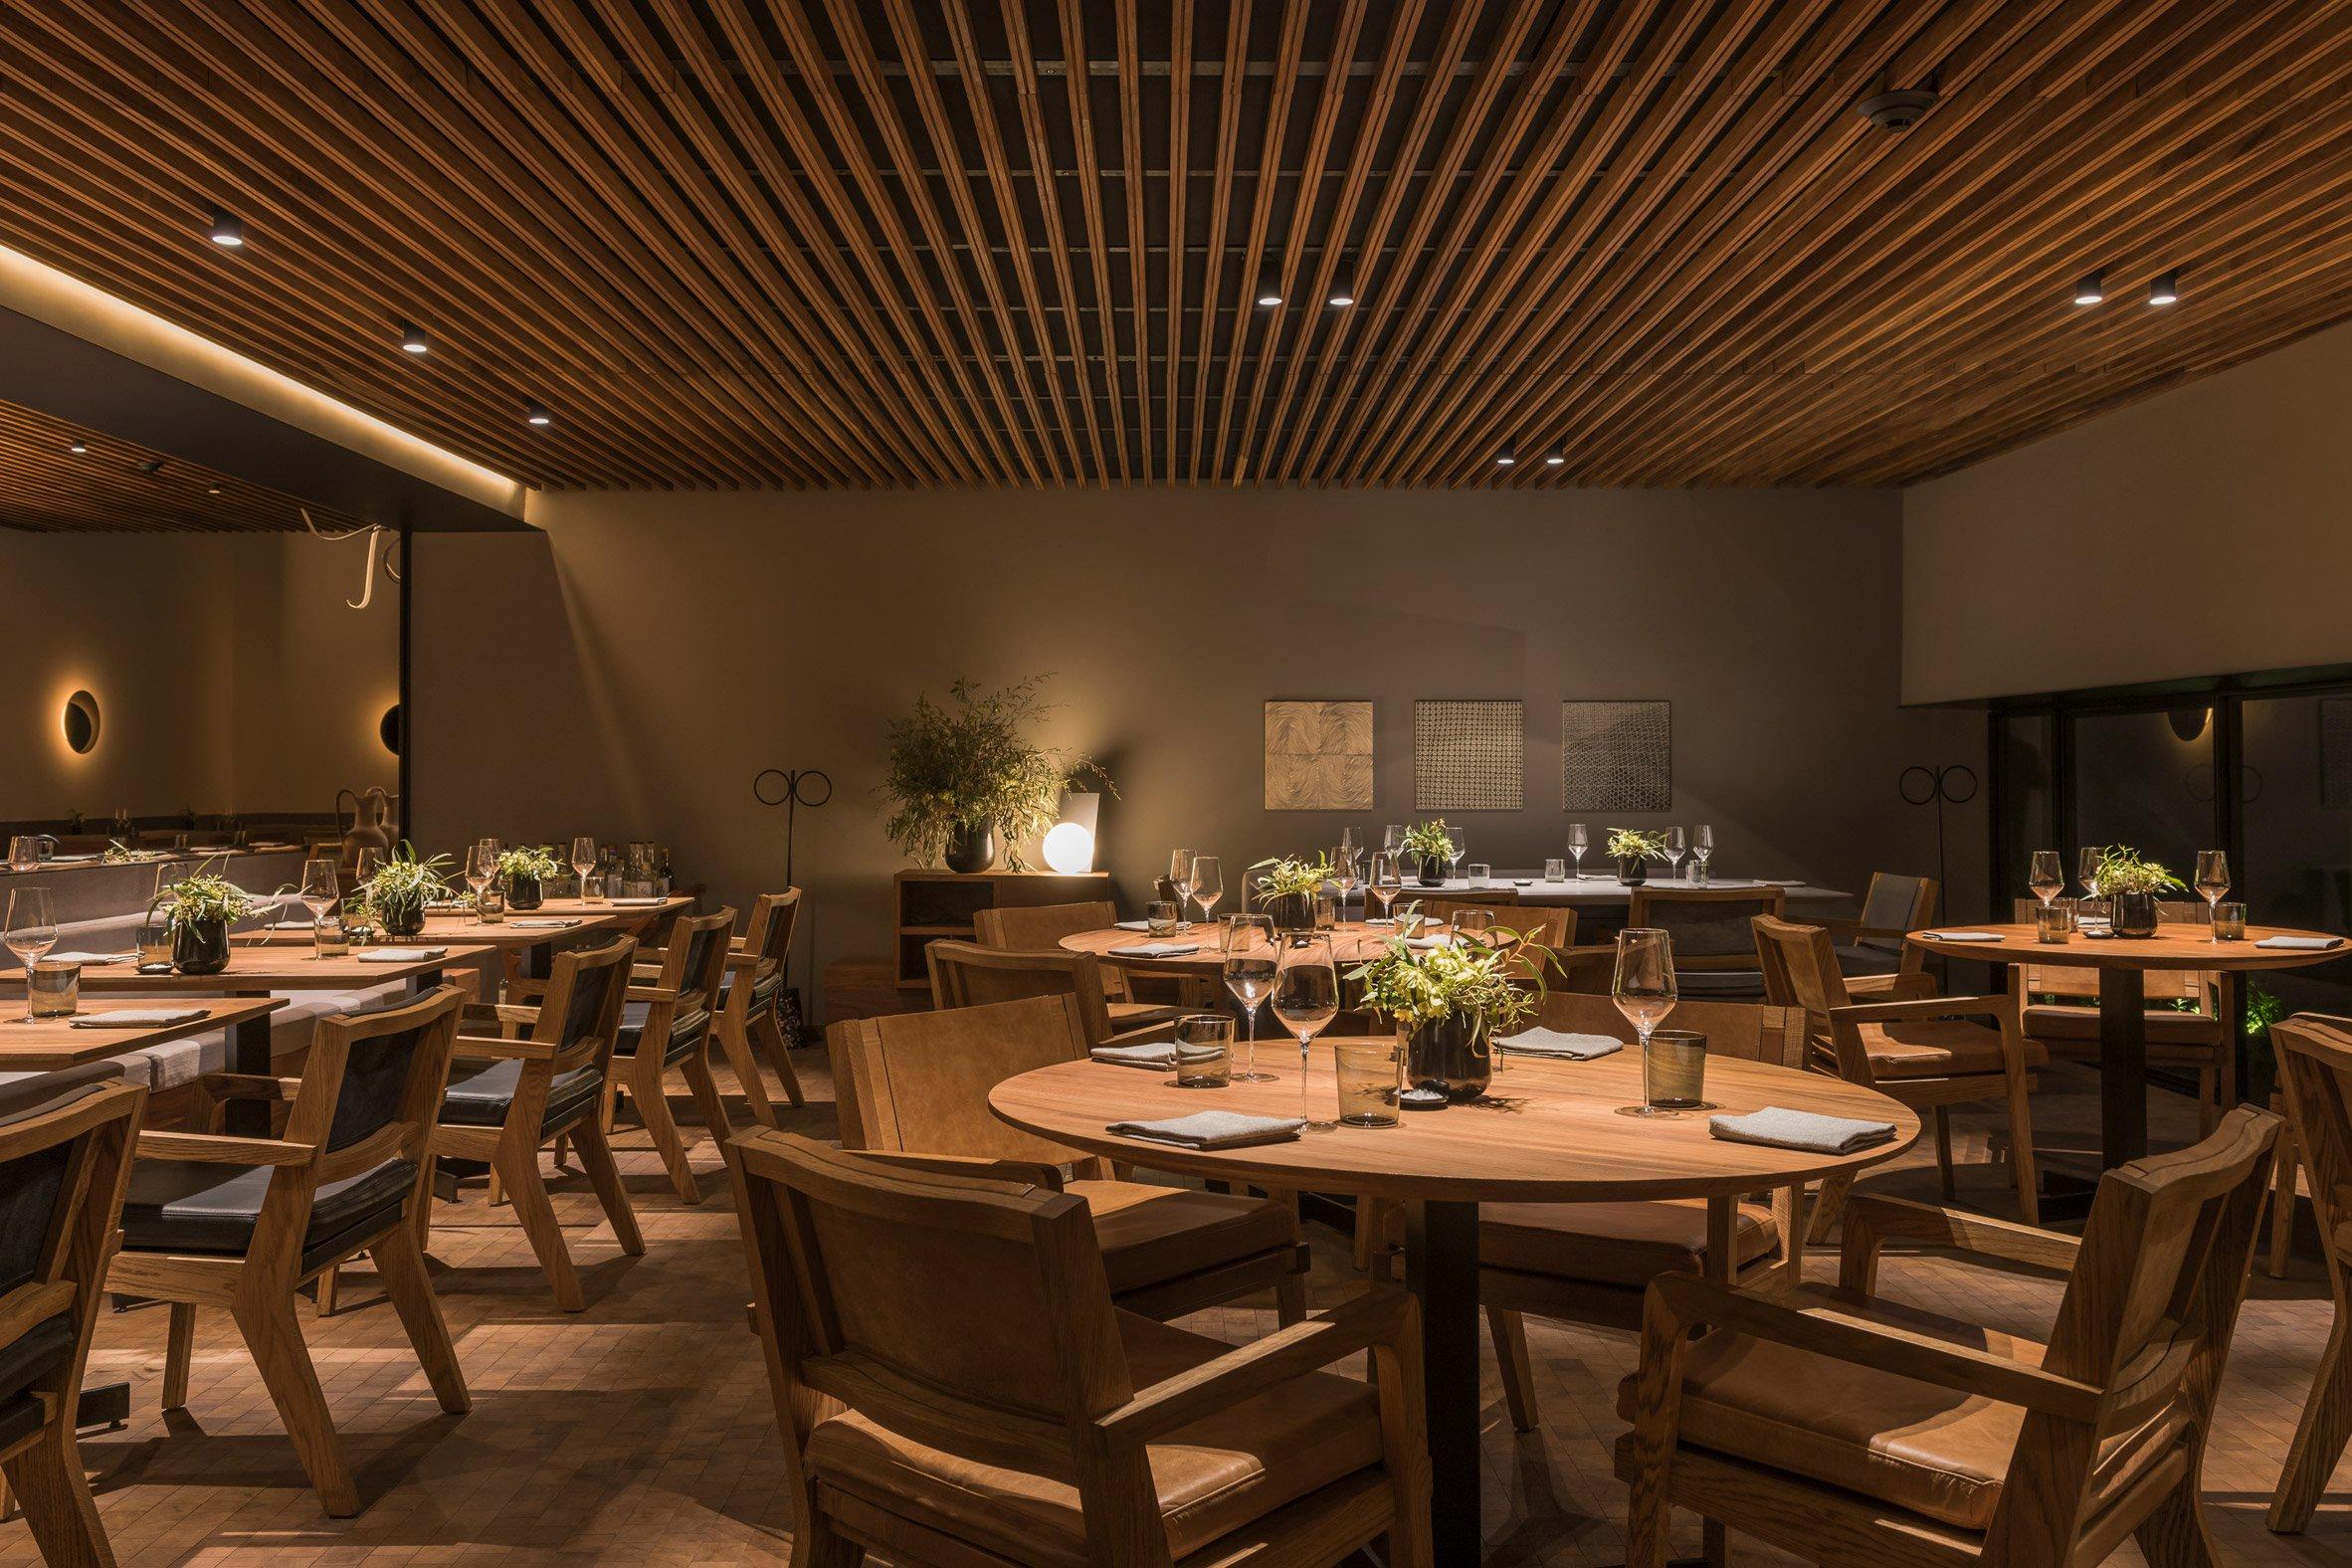 architecture-pujol-restaurant-interiors-design-studia-osnovadesign-osnova-poltava_13